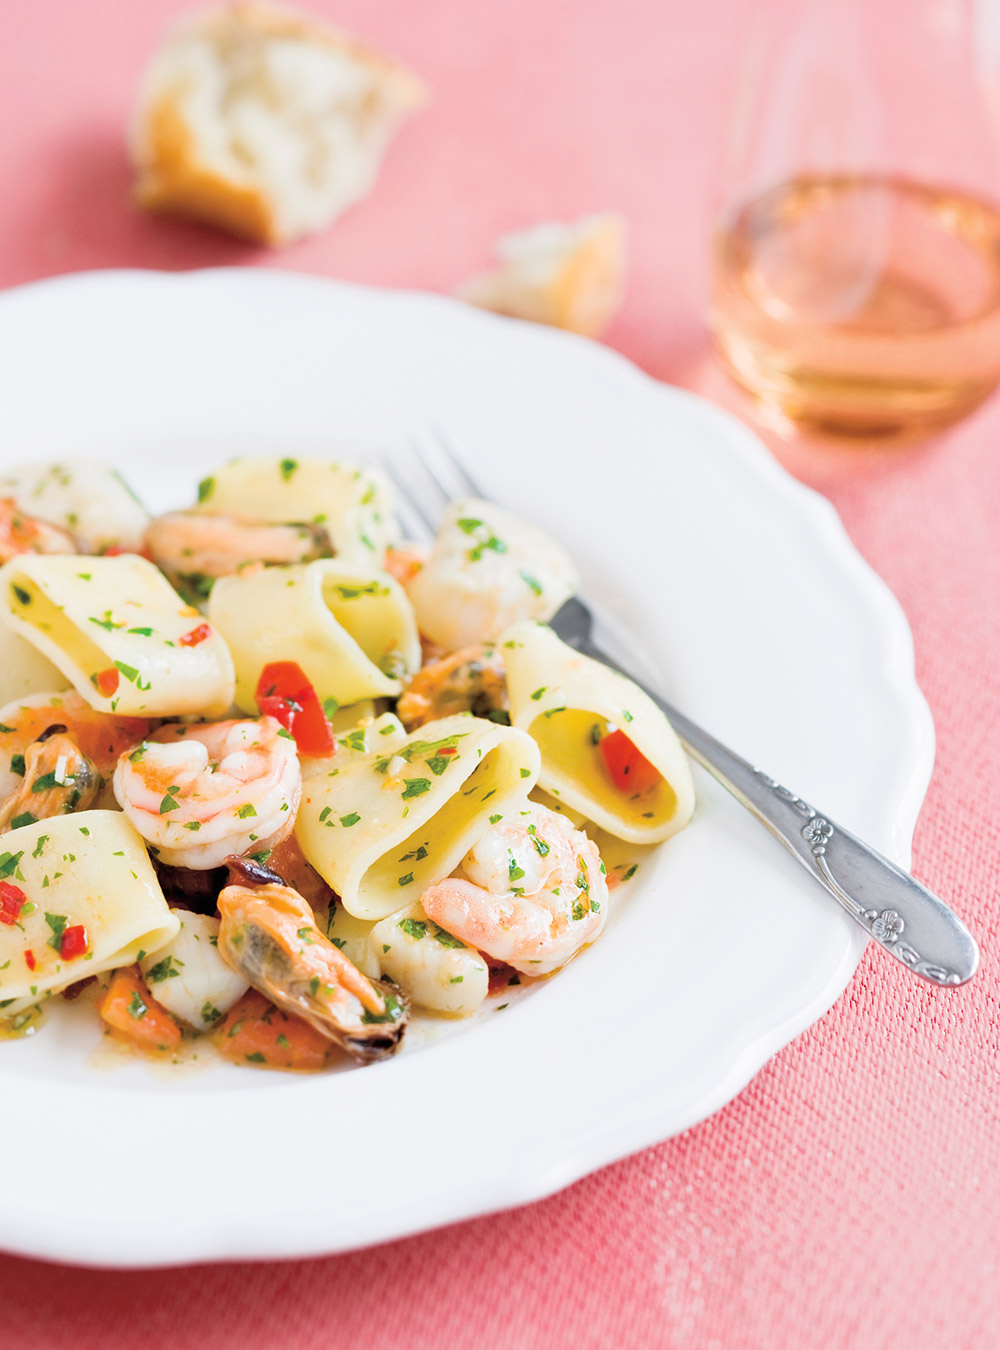 Pâtes italiennes aux fruits de mer (mezzi paccheri ai frutti di mare ...